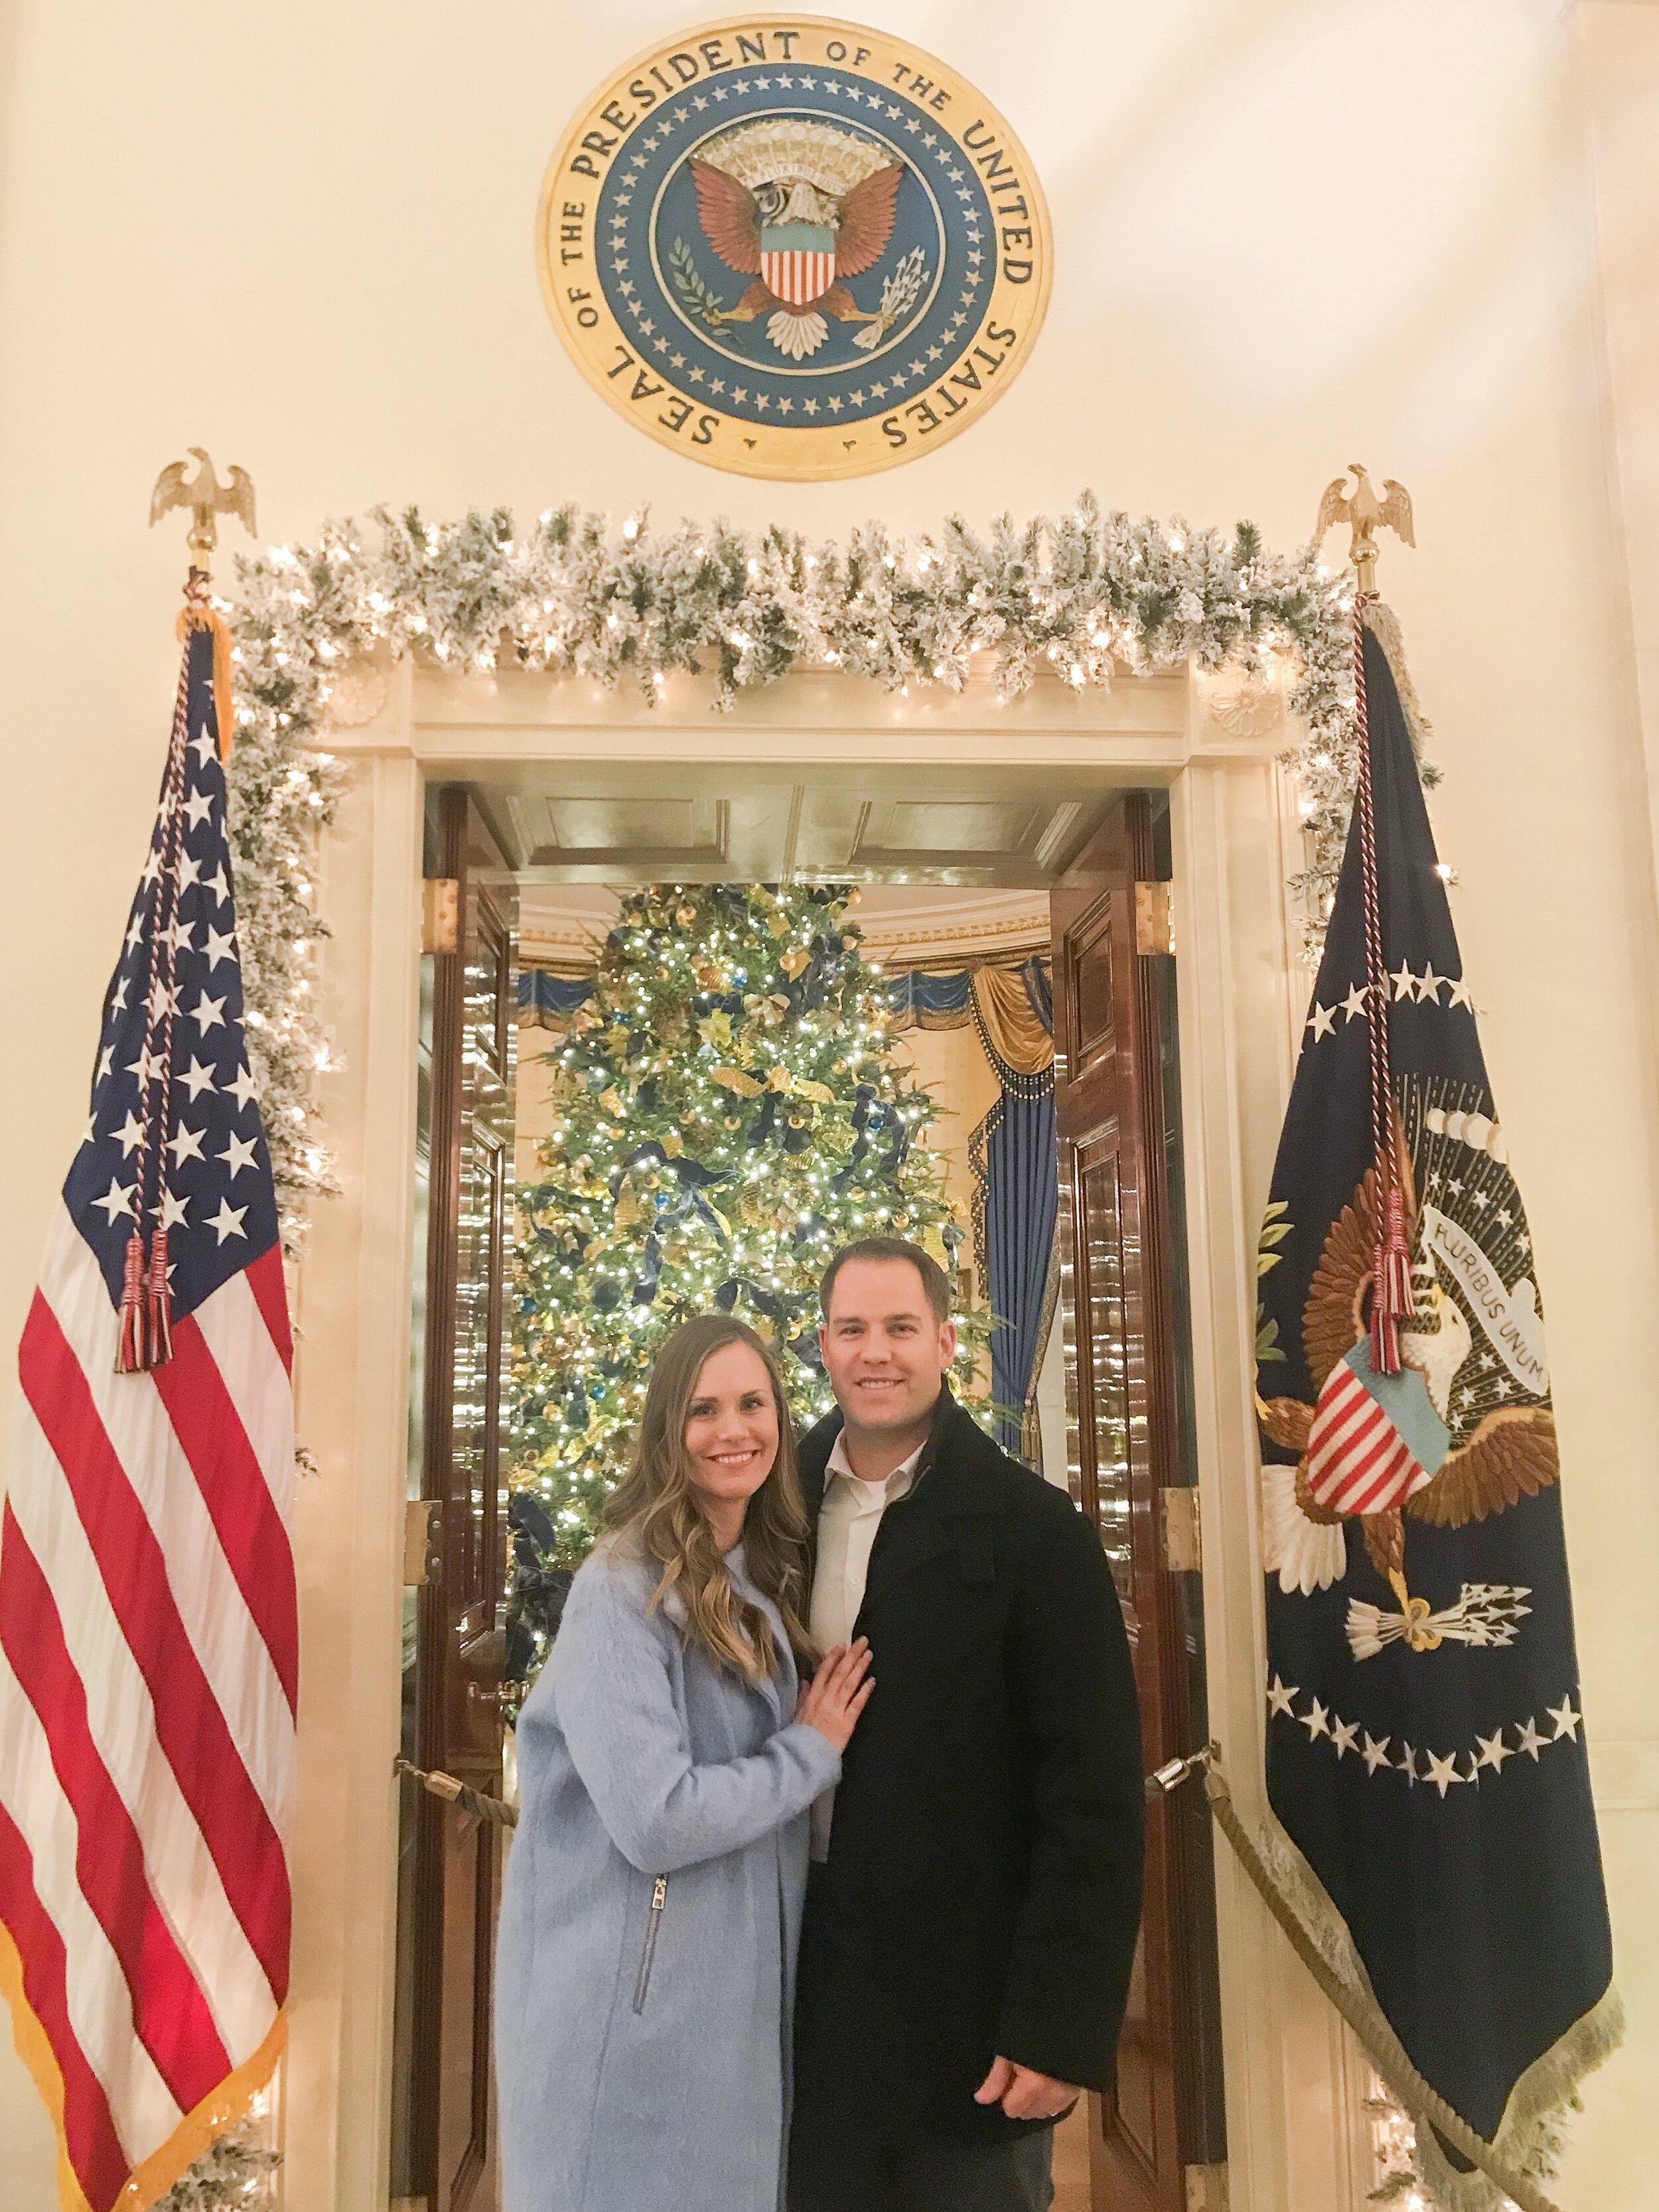 dc-christmas-white-house-tour-abroad-wife.jpg